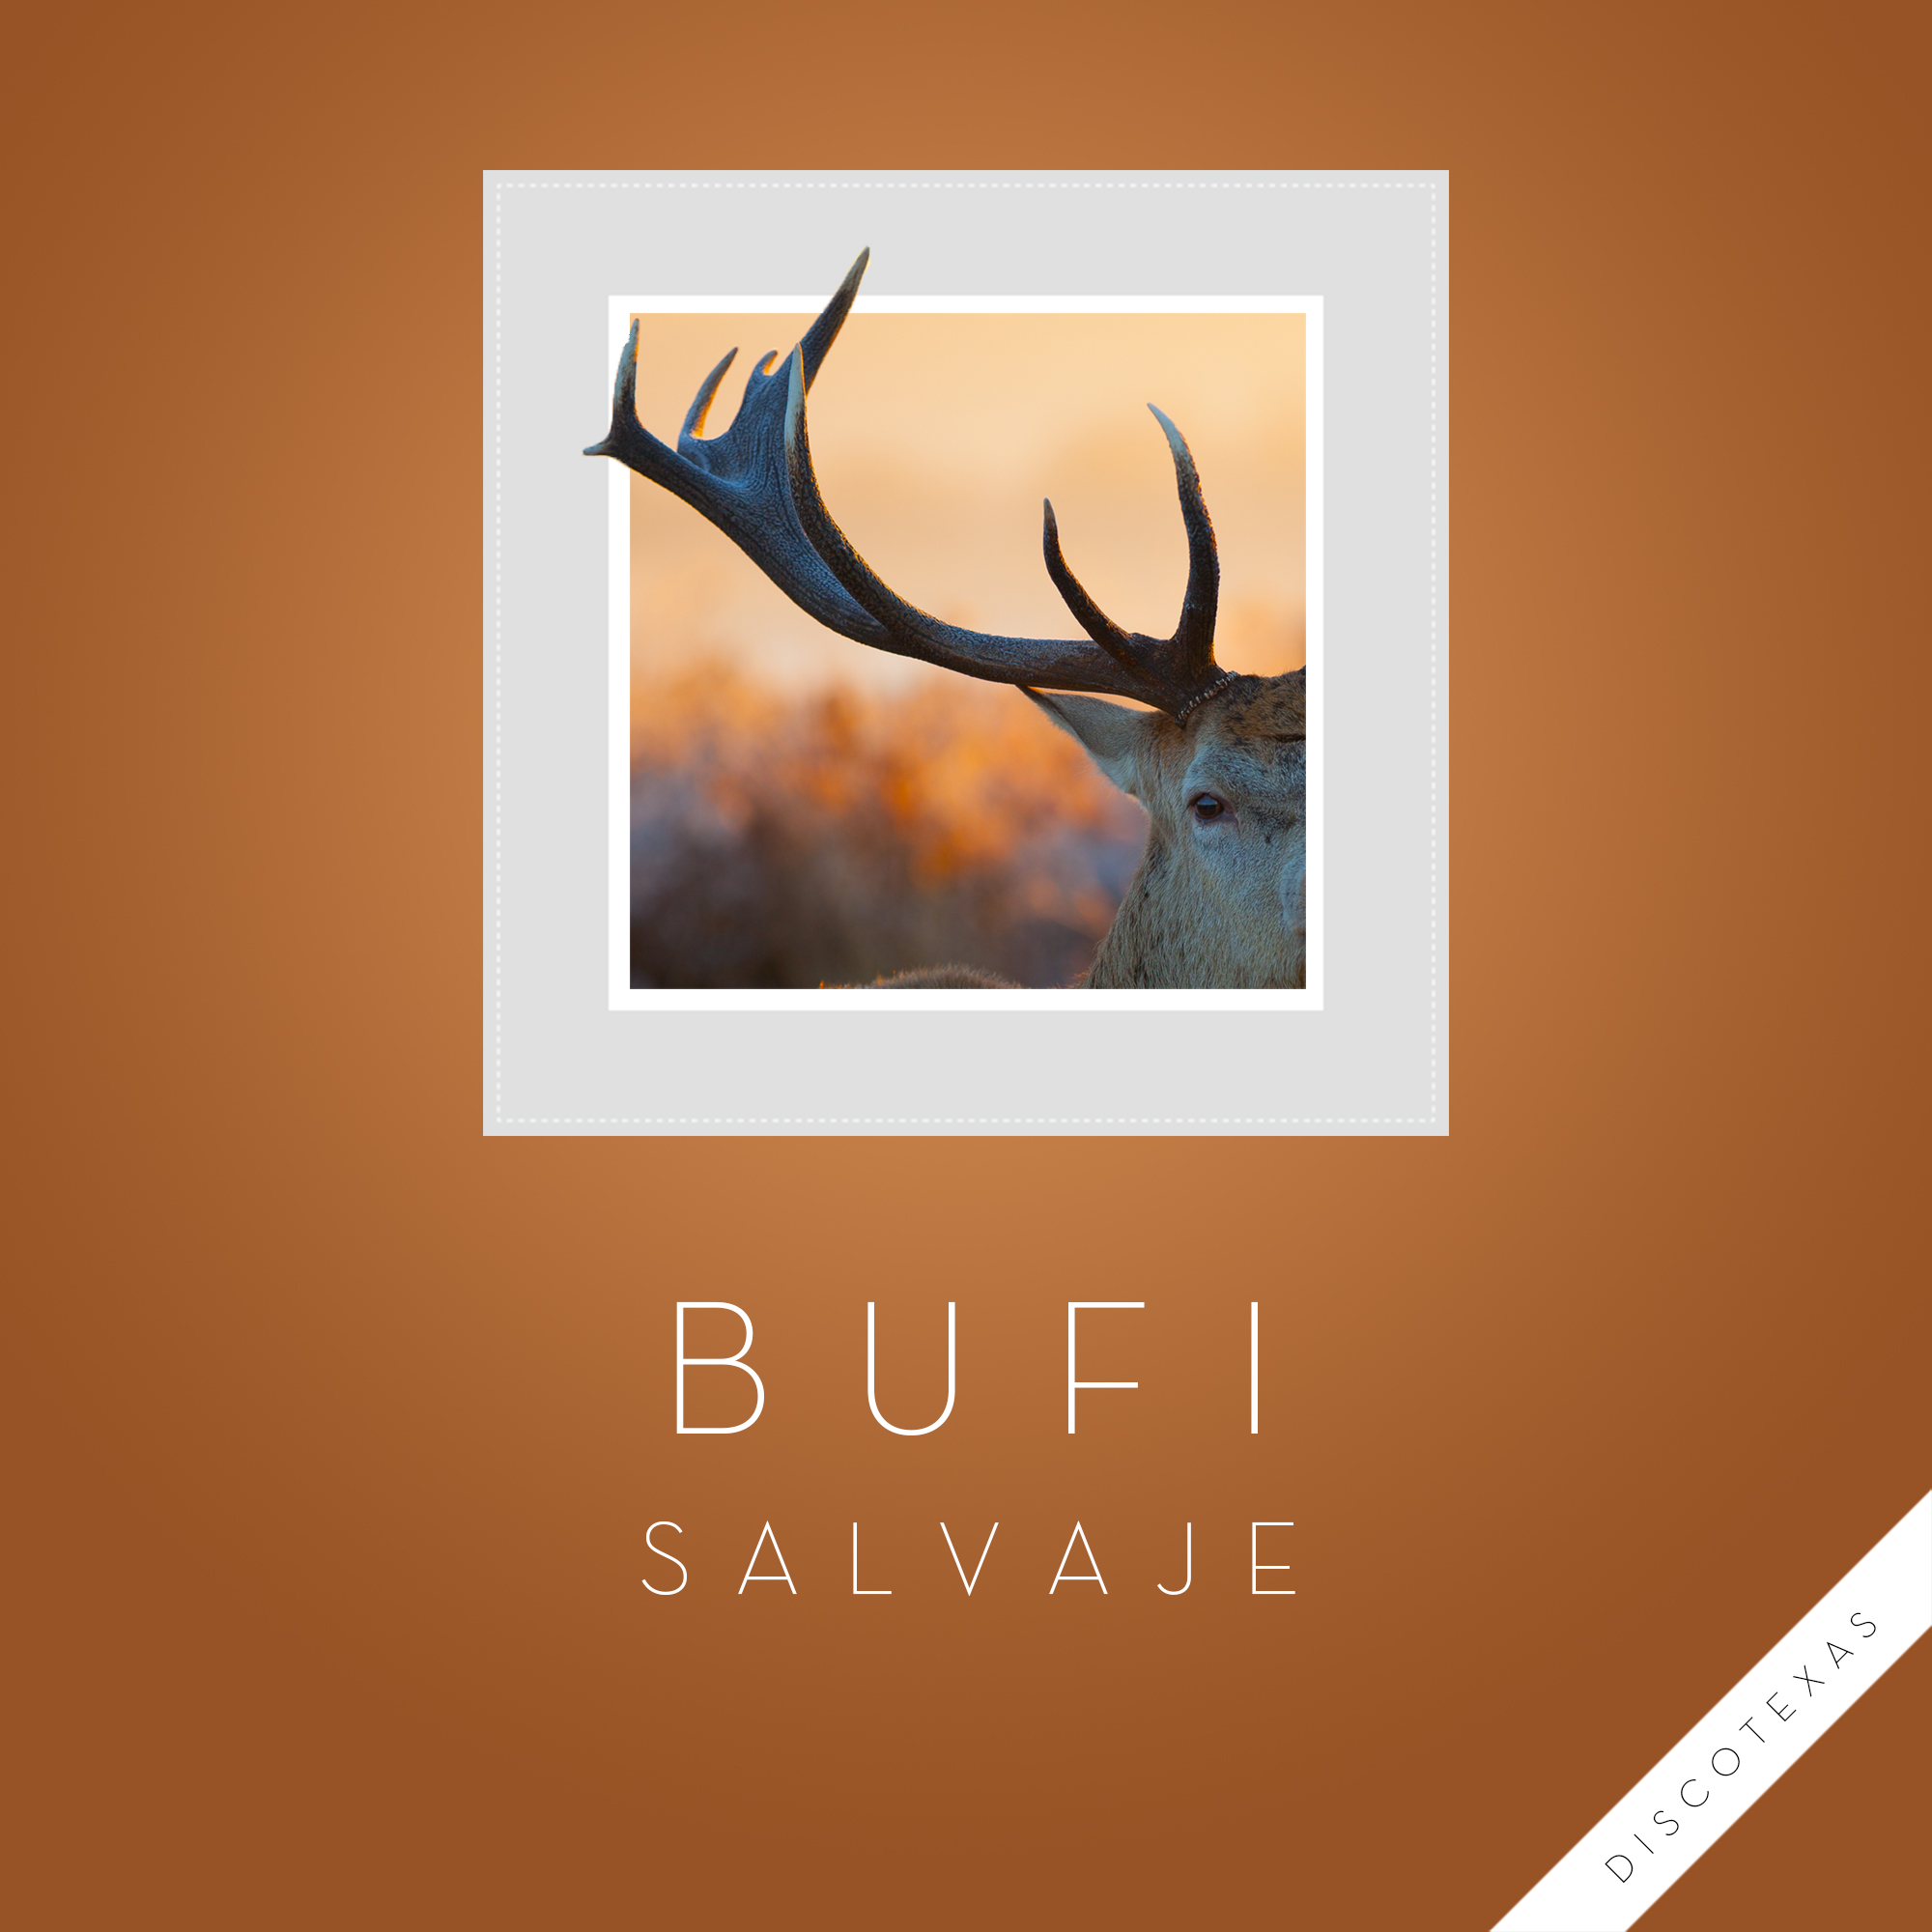 DT032: Bufi - Salvaje